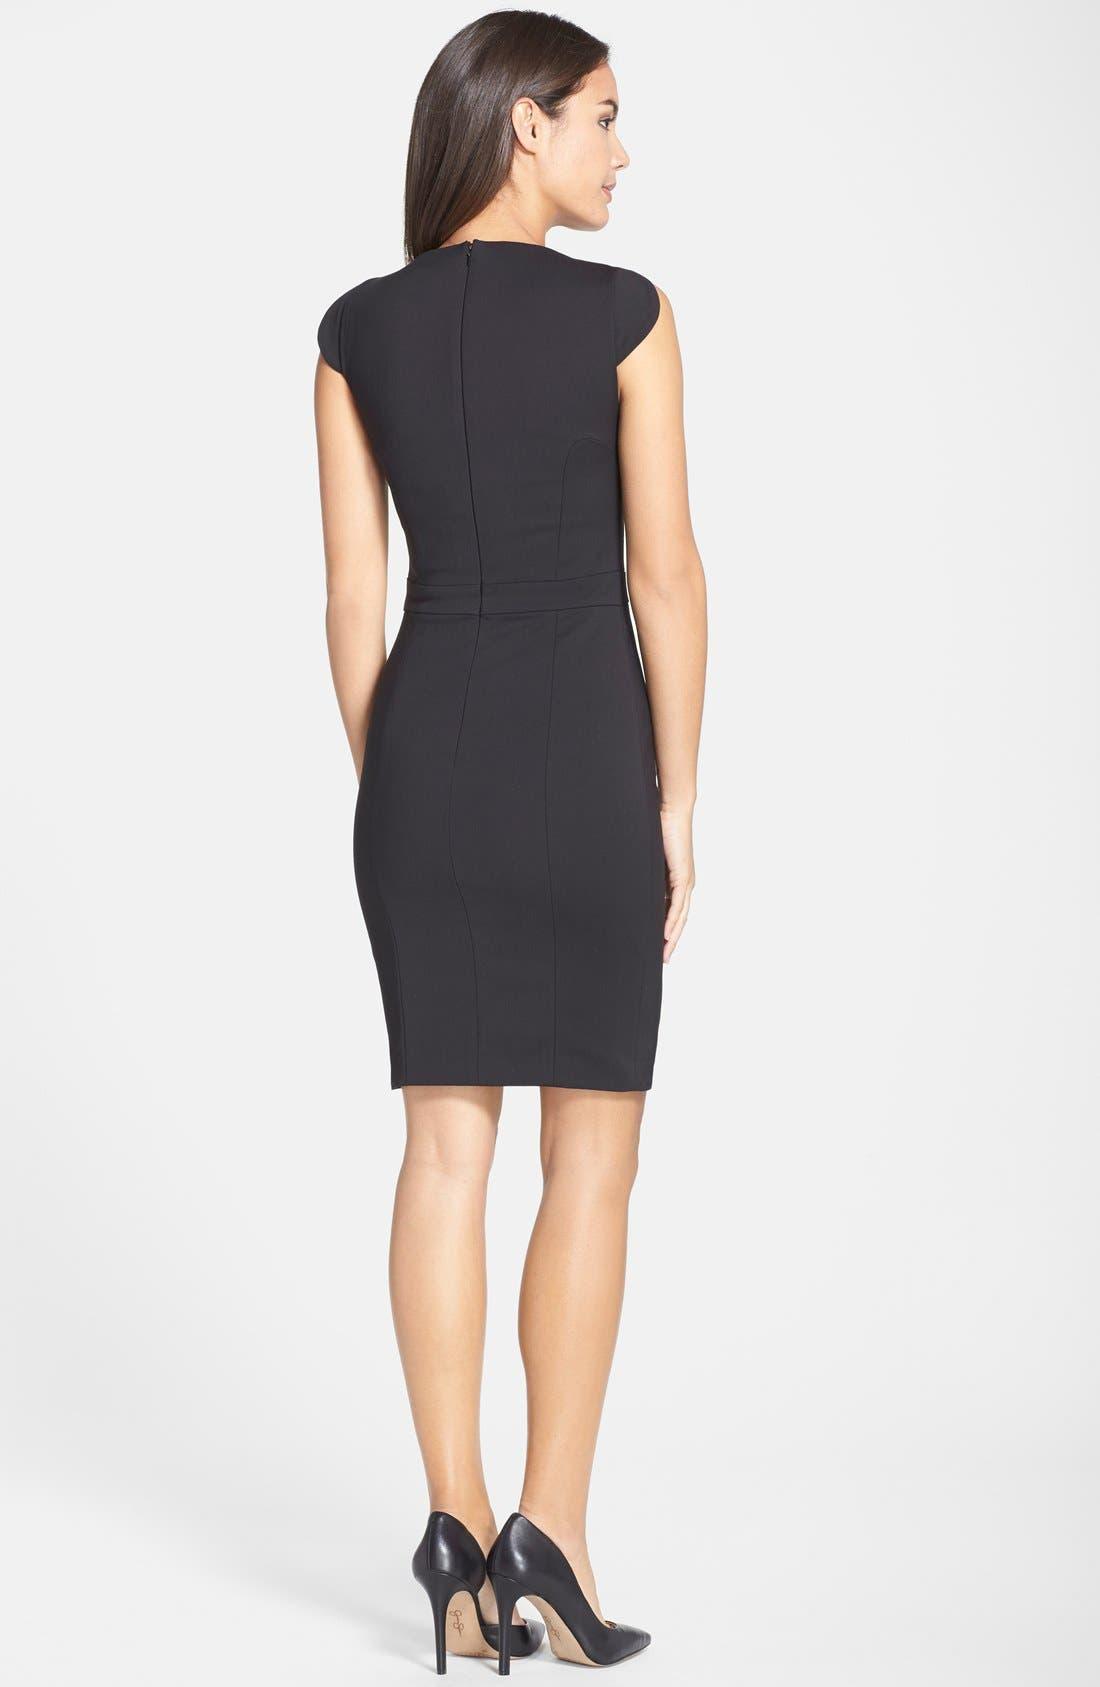 'Lolo' Stretch Sheath Dress,                             Alternate thumbnail 10, color,                             BLACK